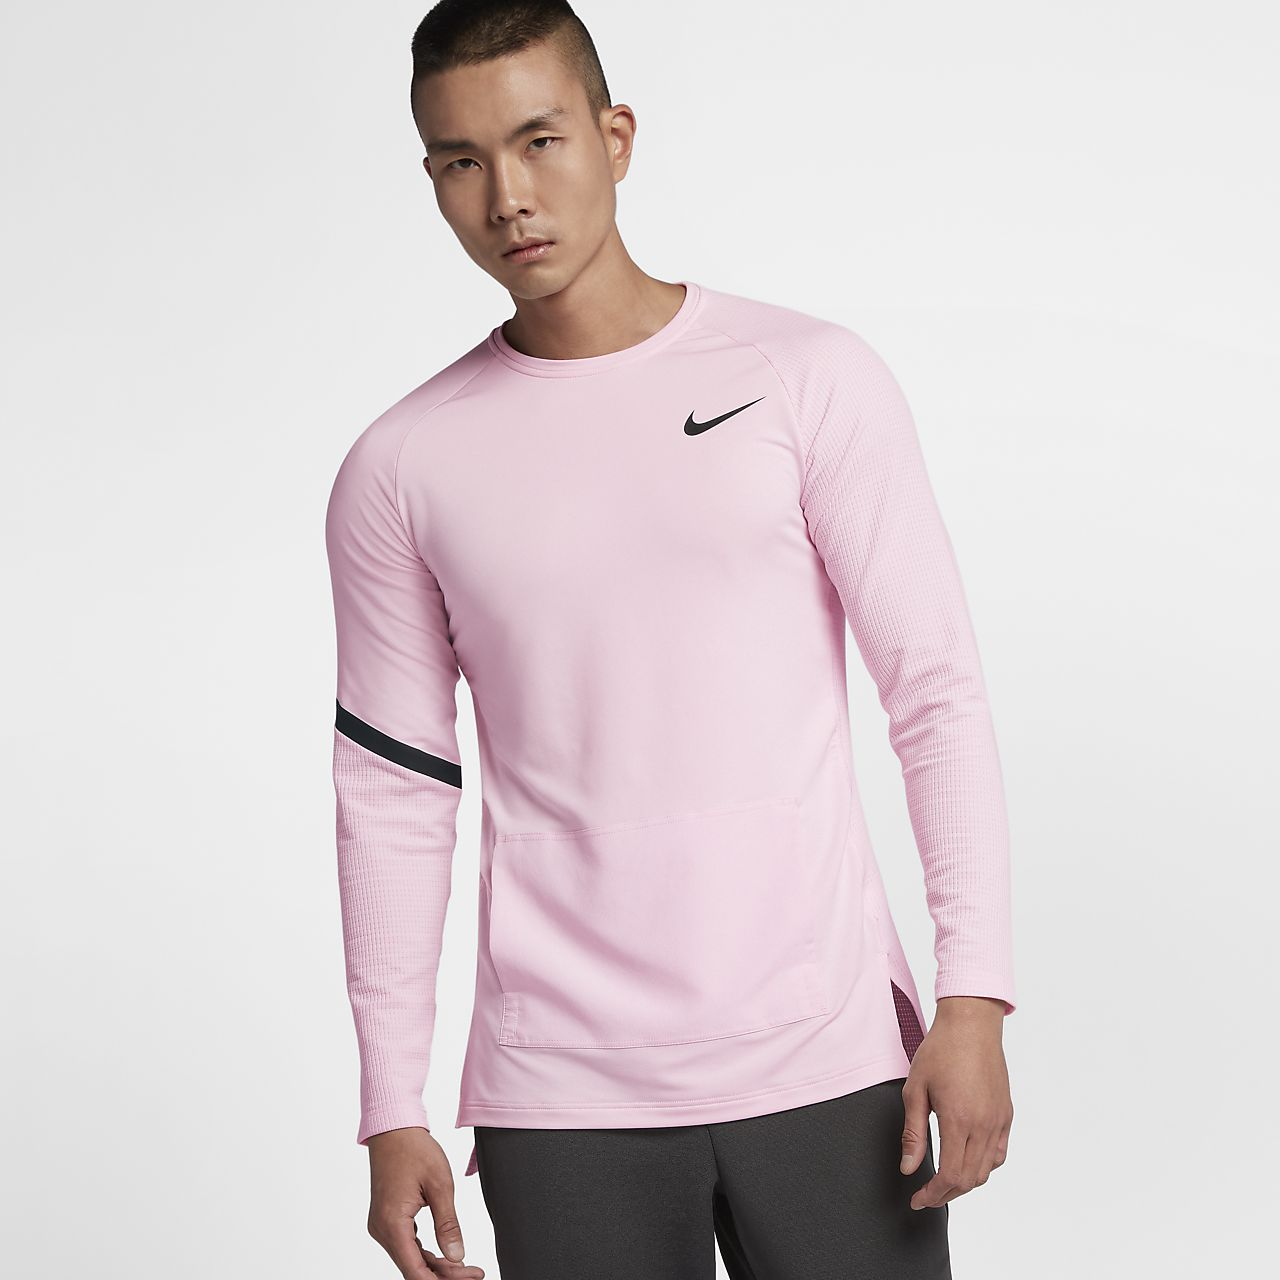 Långärmad tröja Nike Pro Modern för män